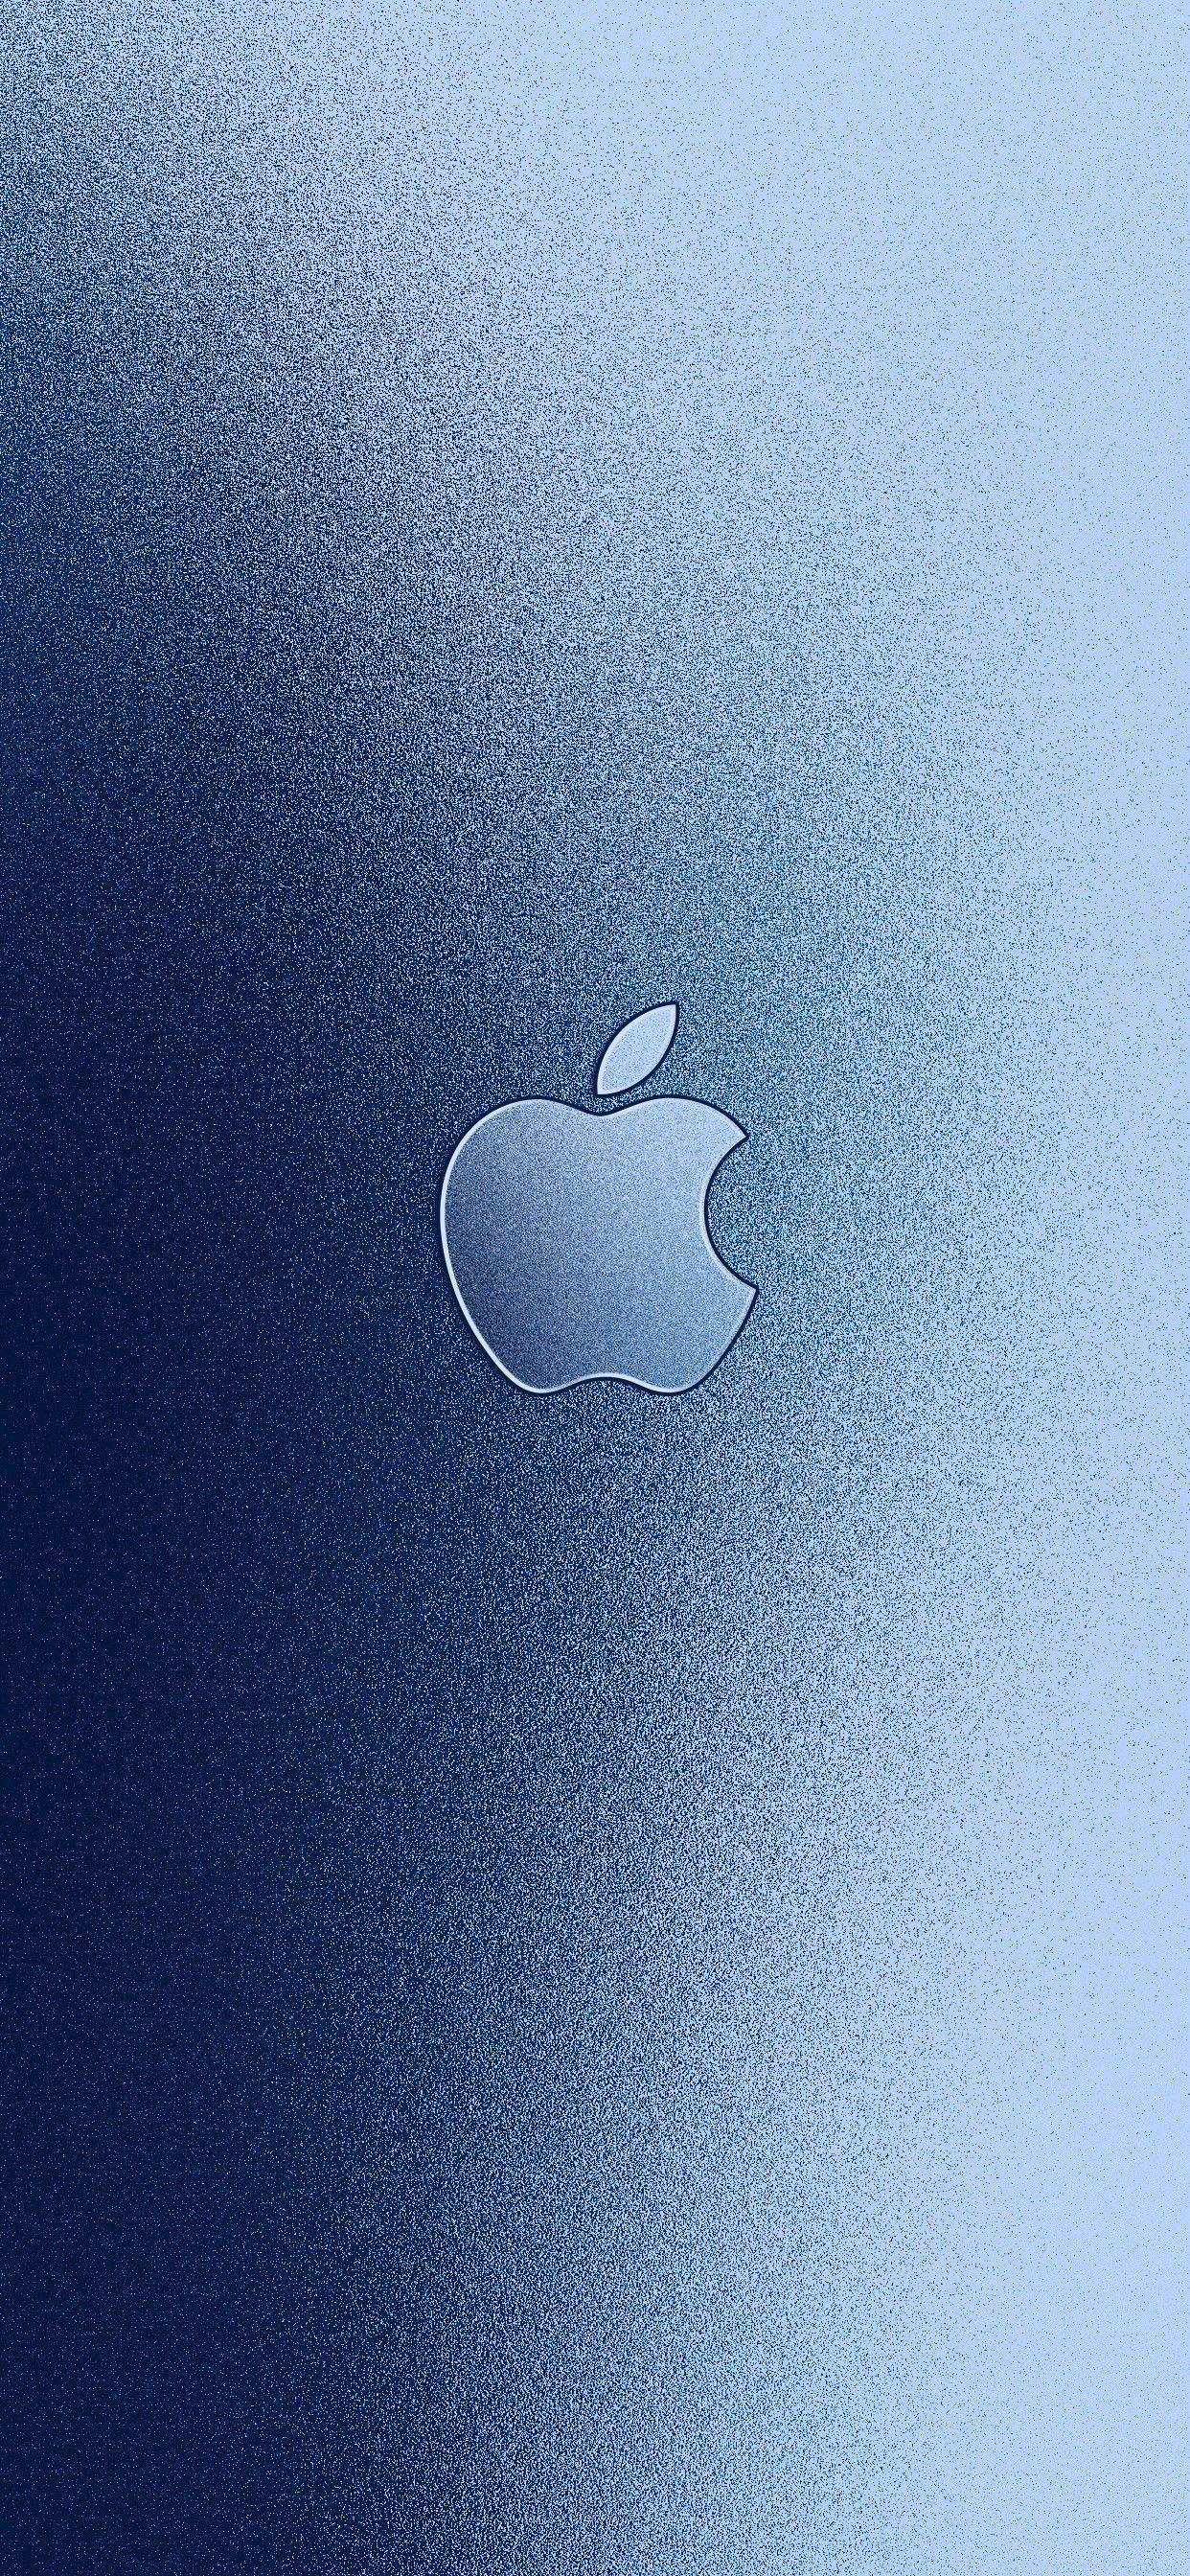 Apple Logo 4k Wallpapers Top Free Apple Logo 4k Backgrounds Wallpaperaccess